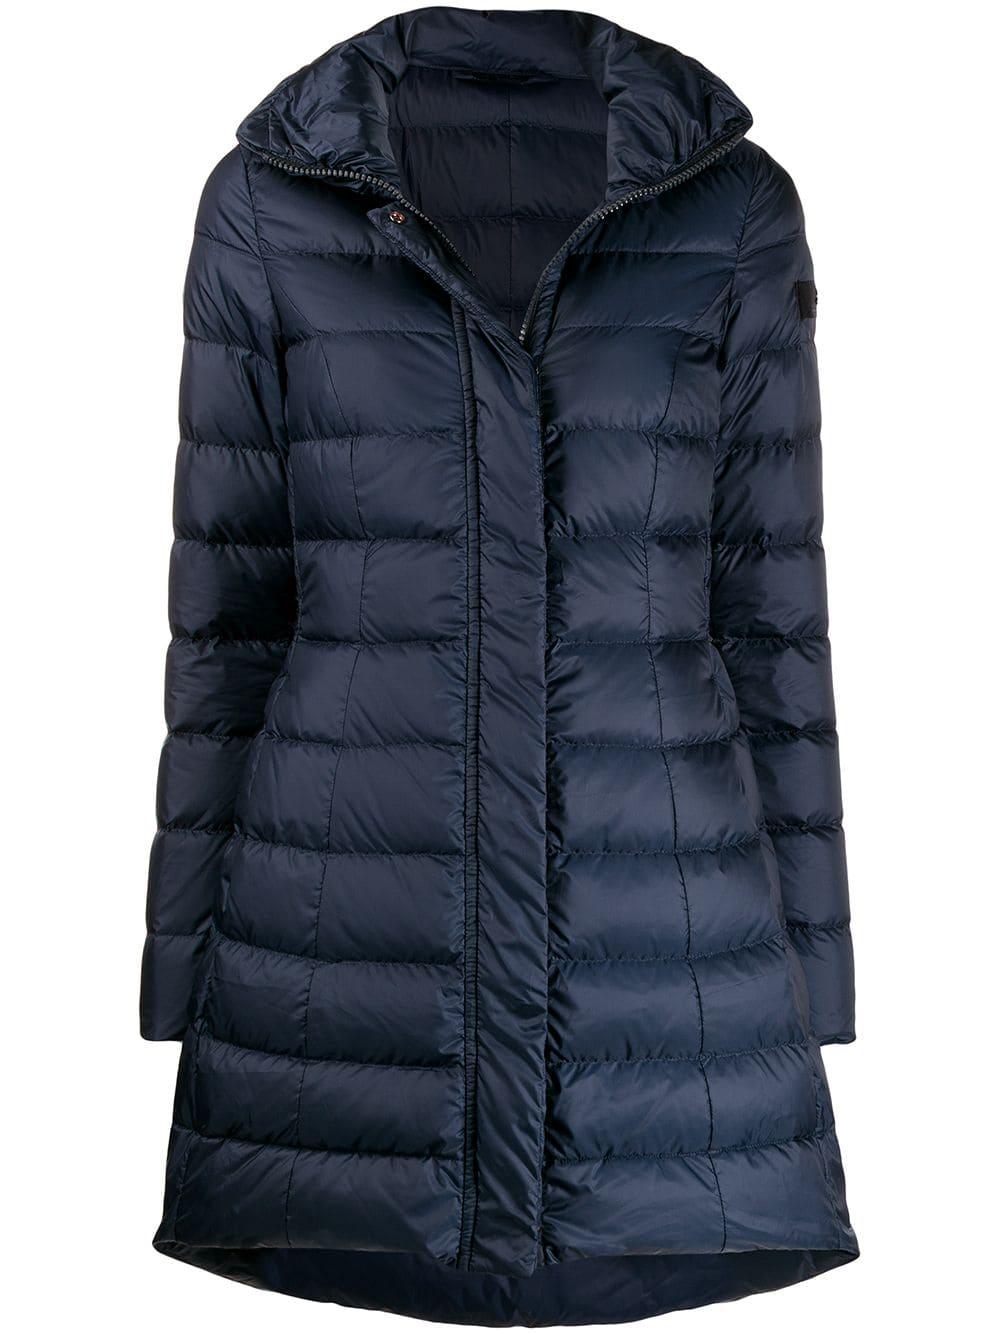 Sobchak Down Coat